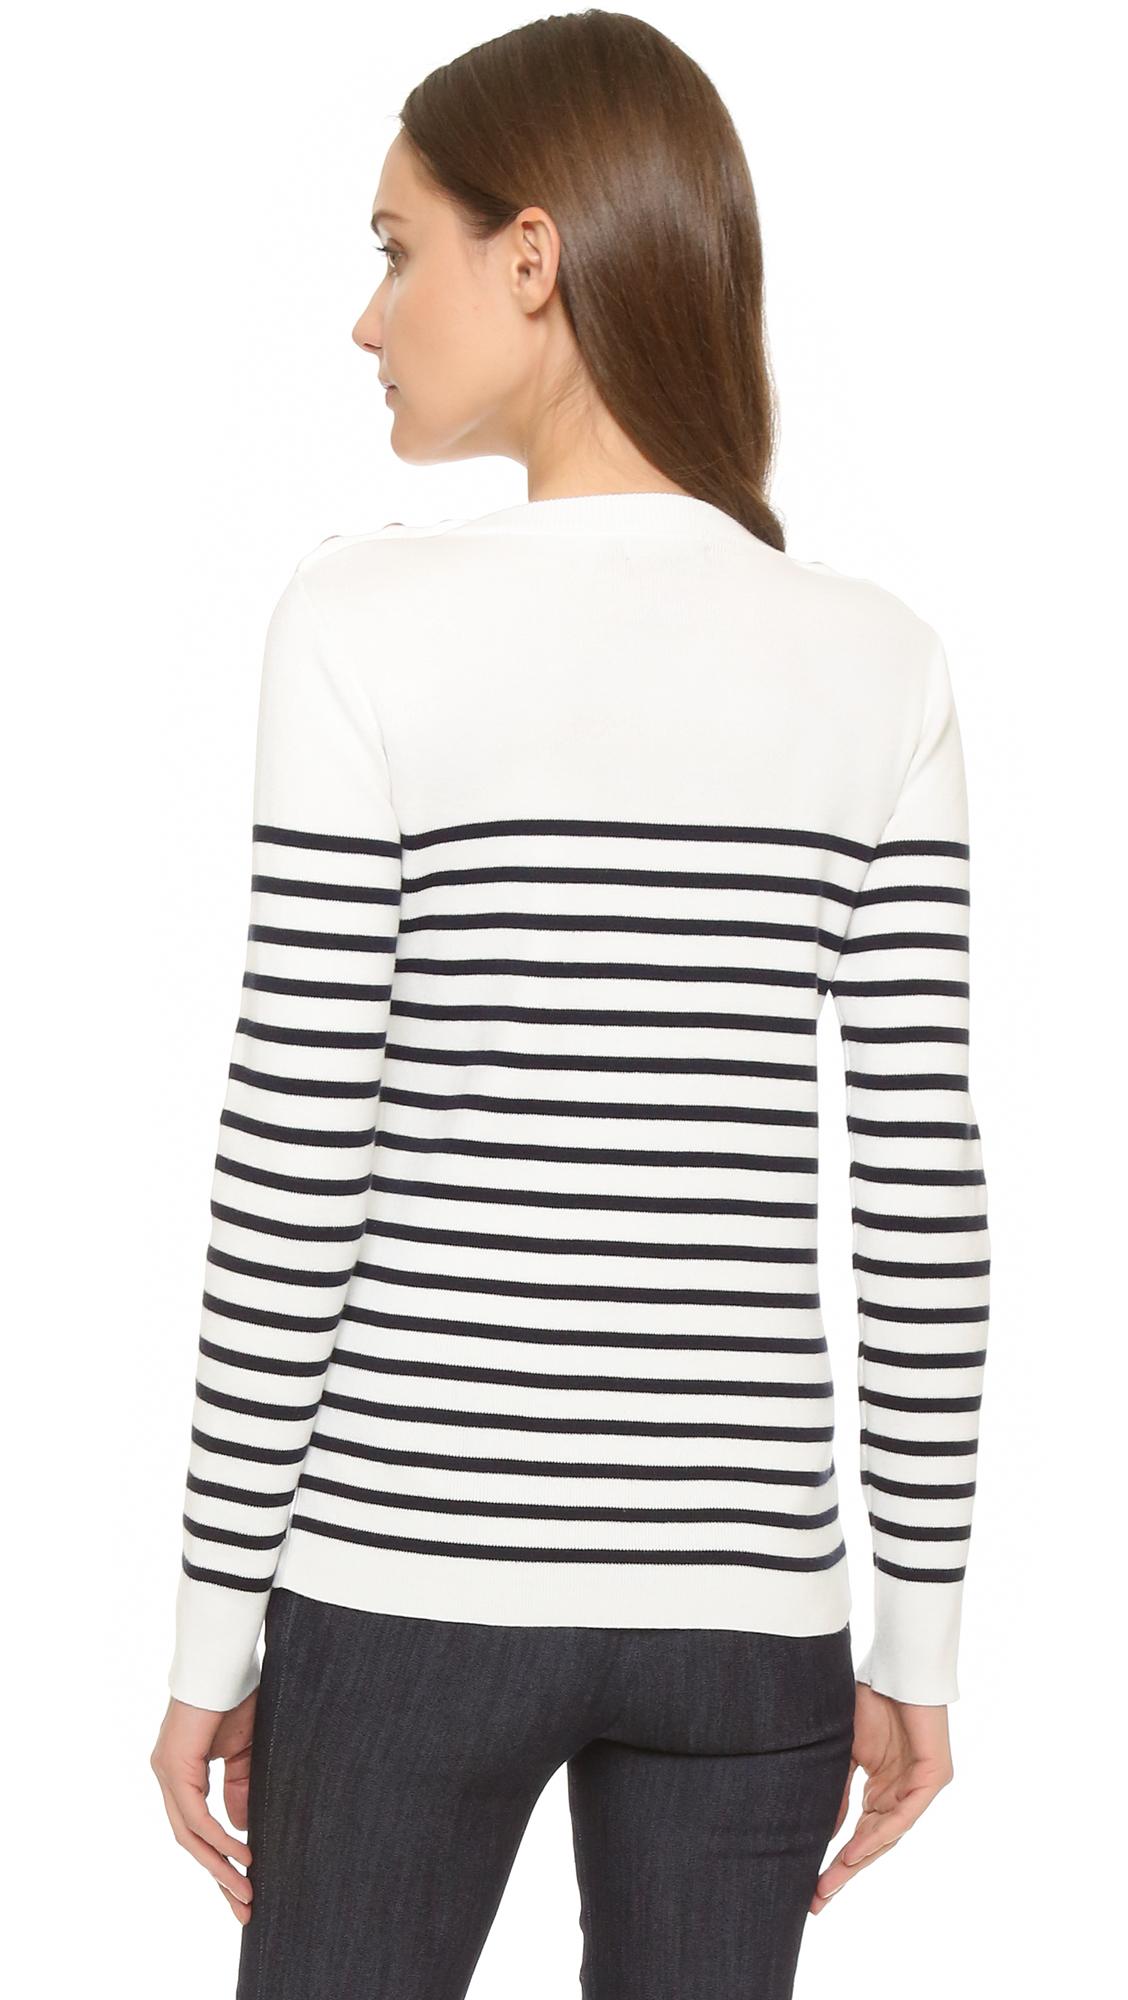 Lyst petit bateau knit striped sweater in white for Petit bateau striped shirt